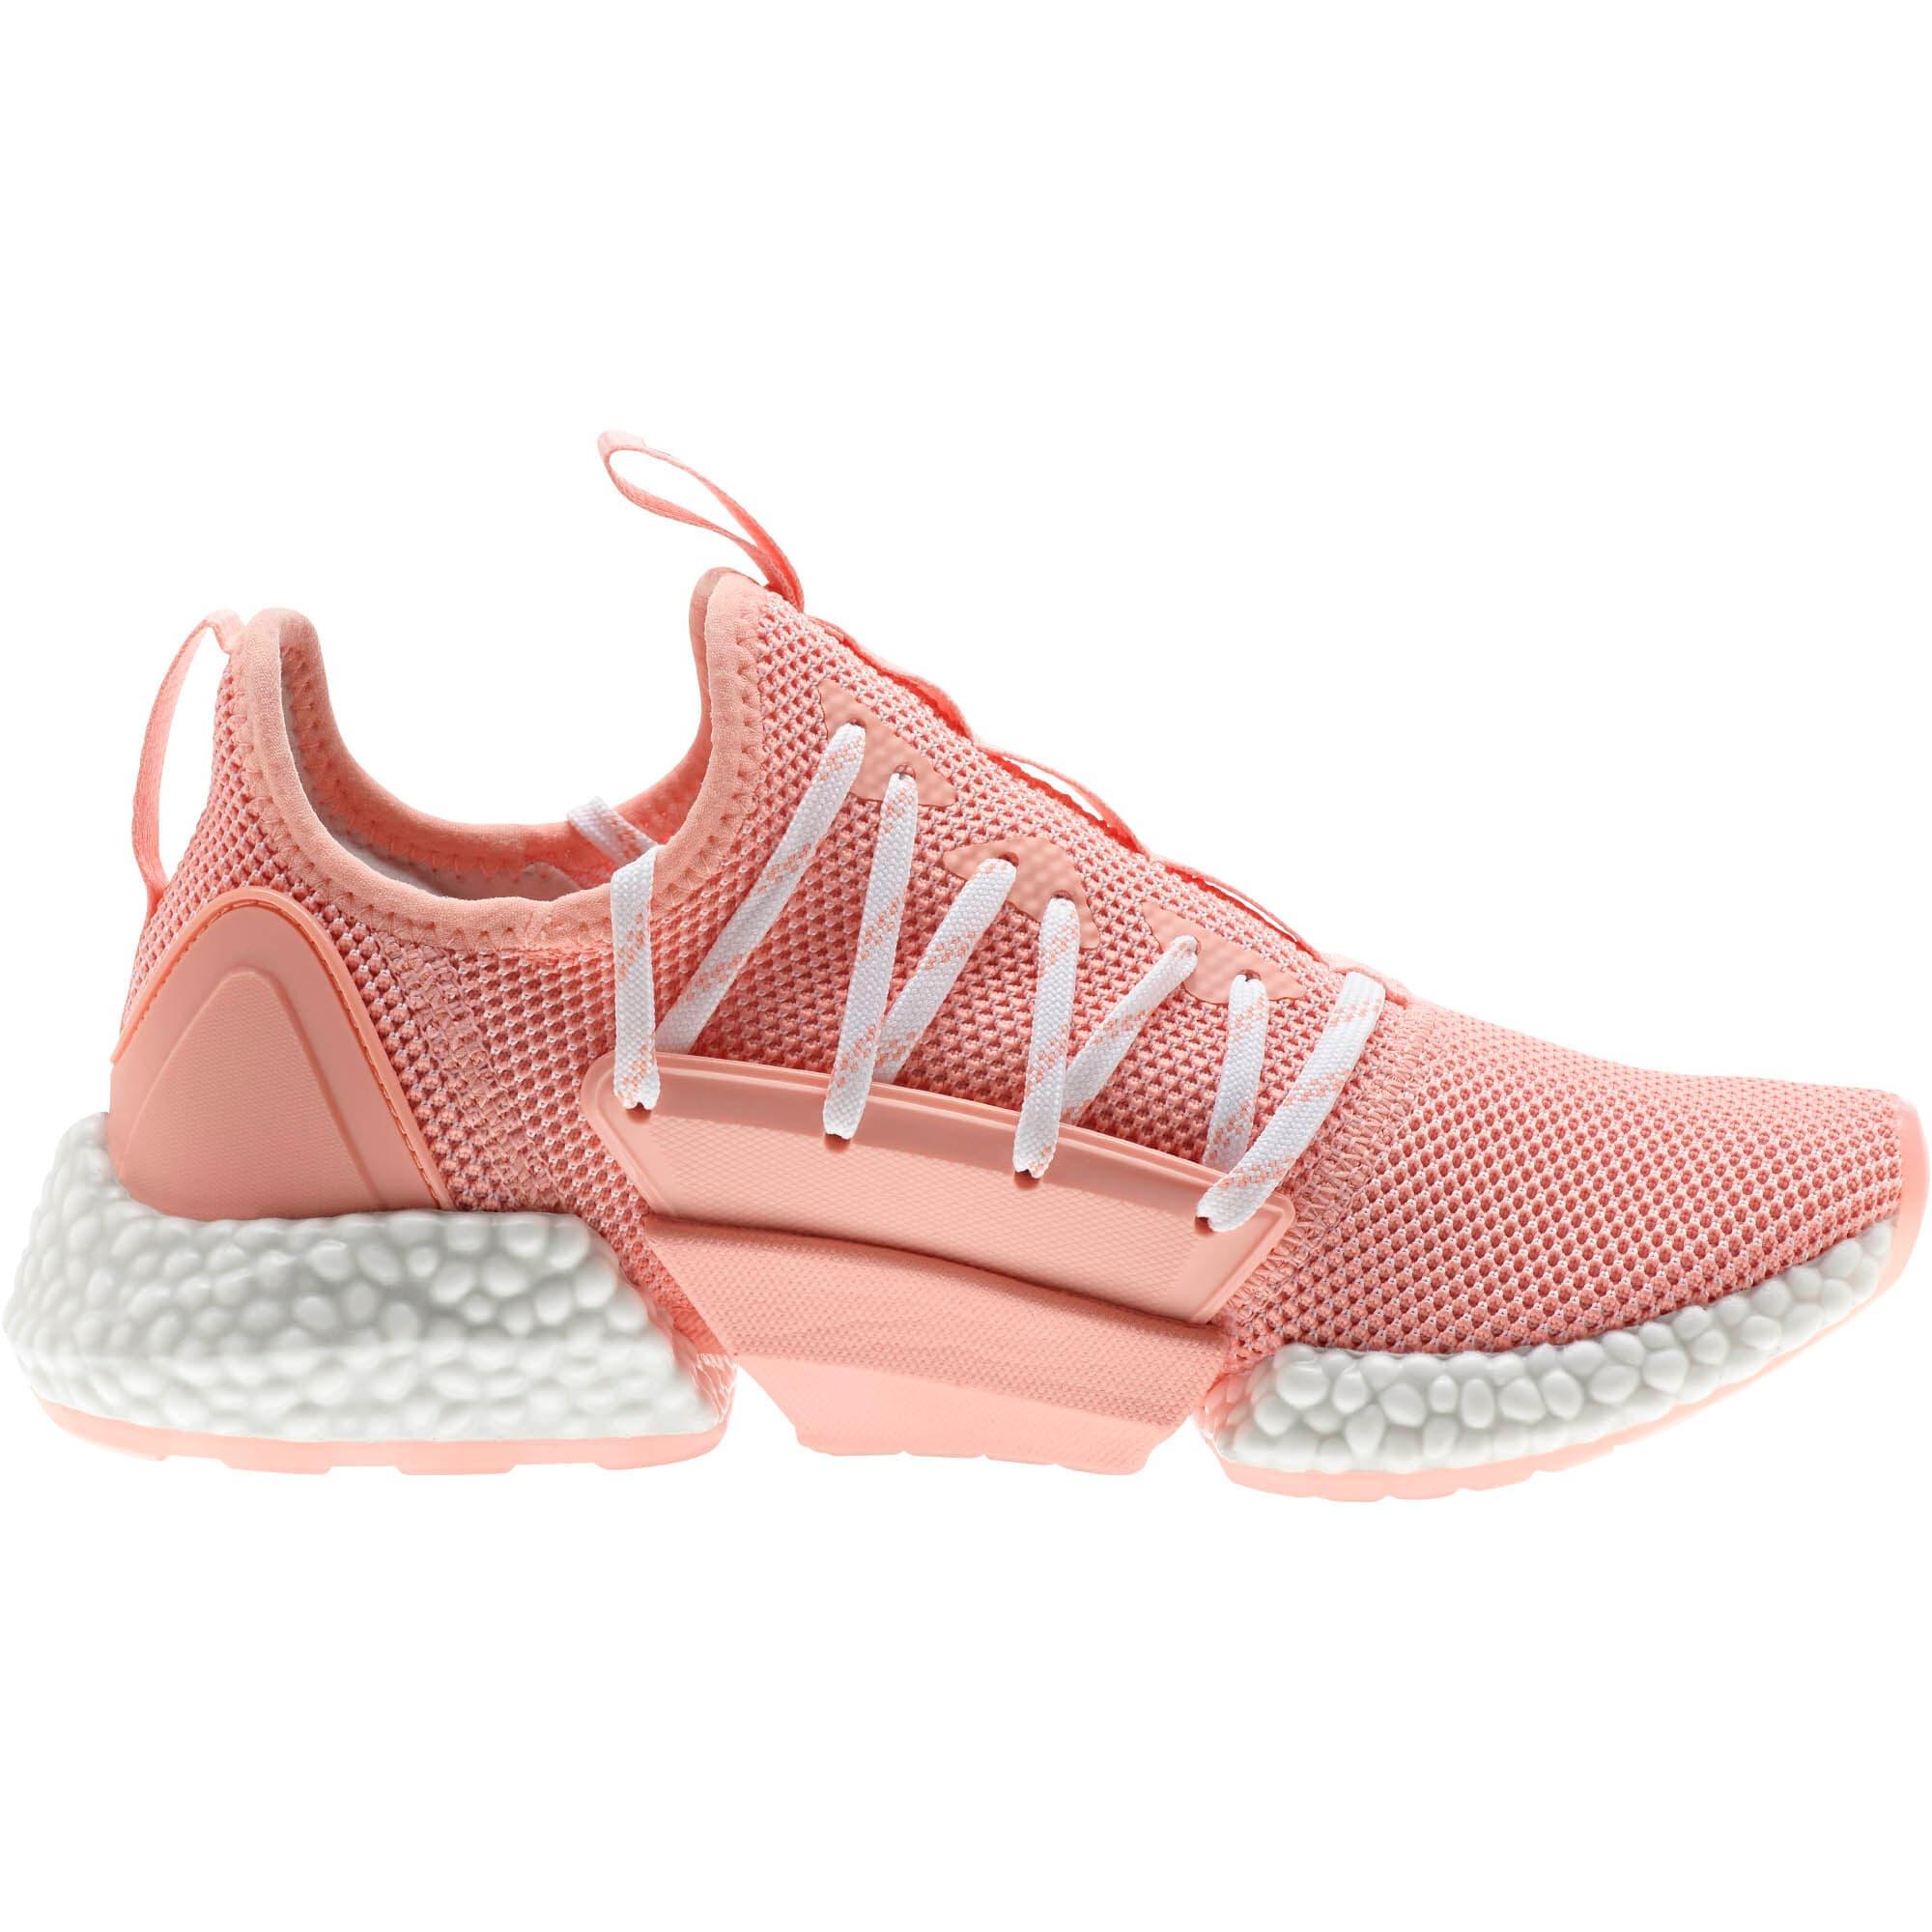 Miniatura 4 de Zapatos para correr HYBRID Rocket Runner para mujer, Peach Bud-Puma White, mediano